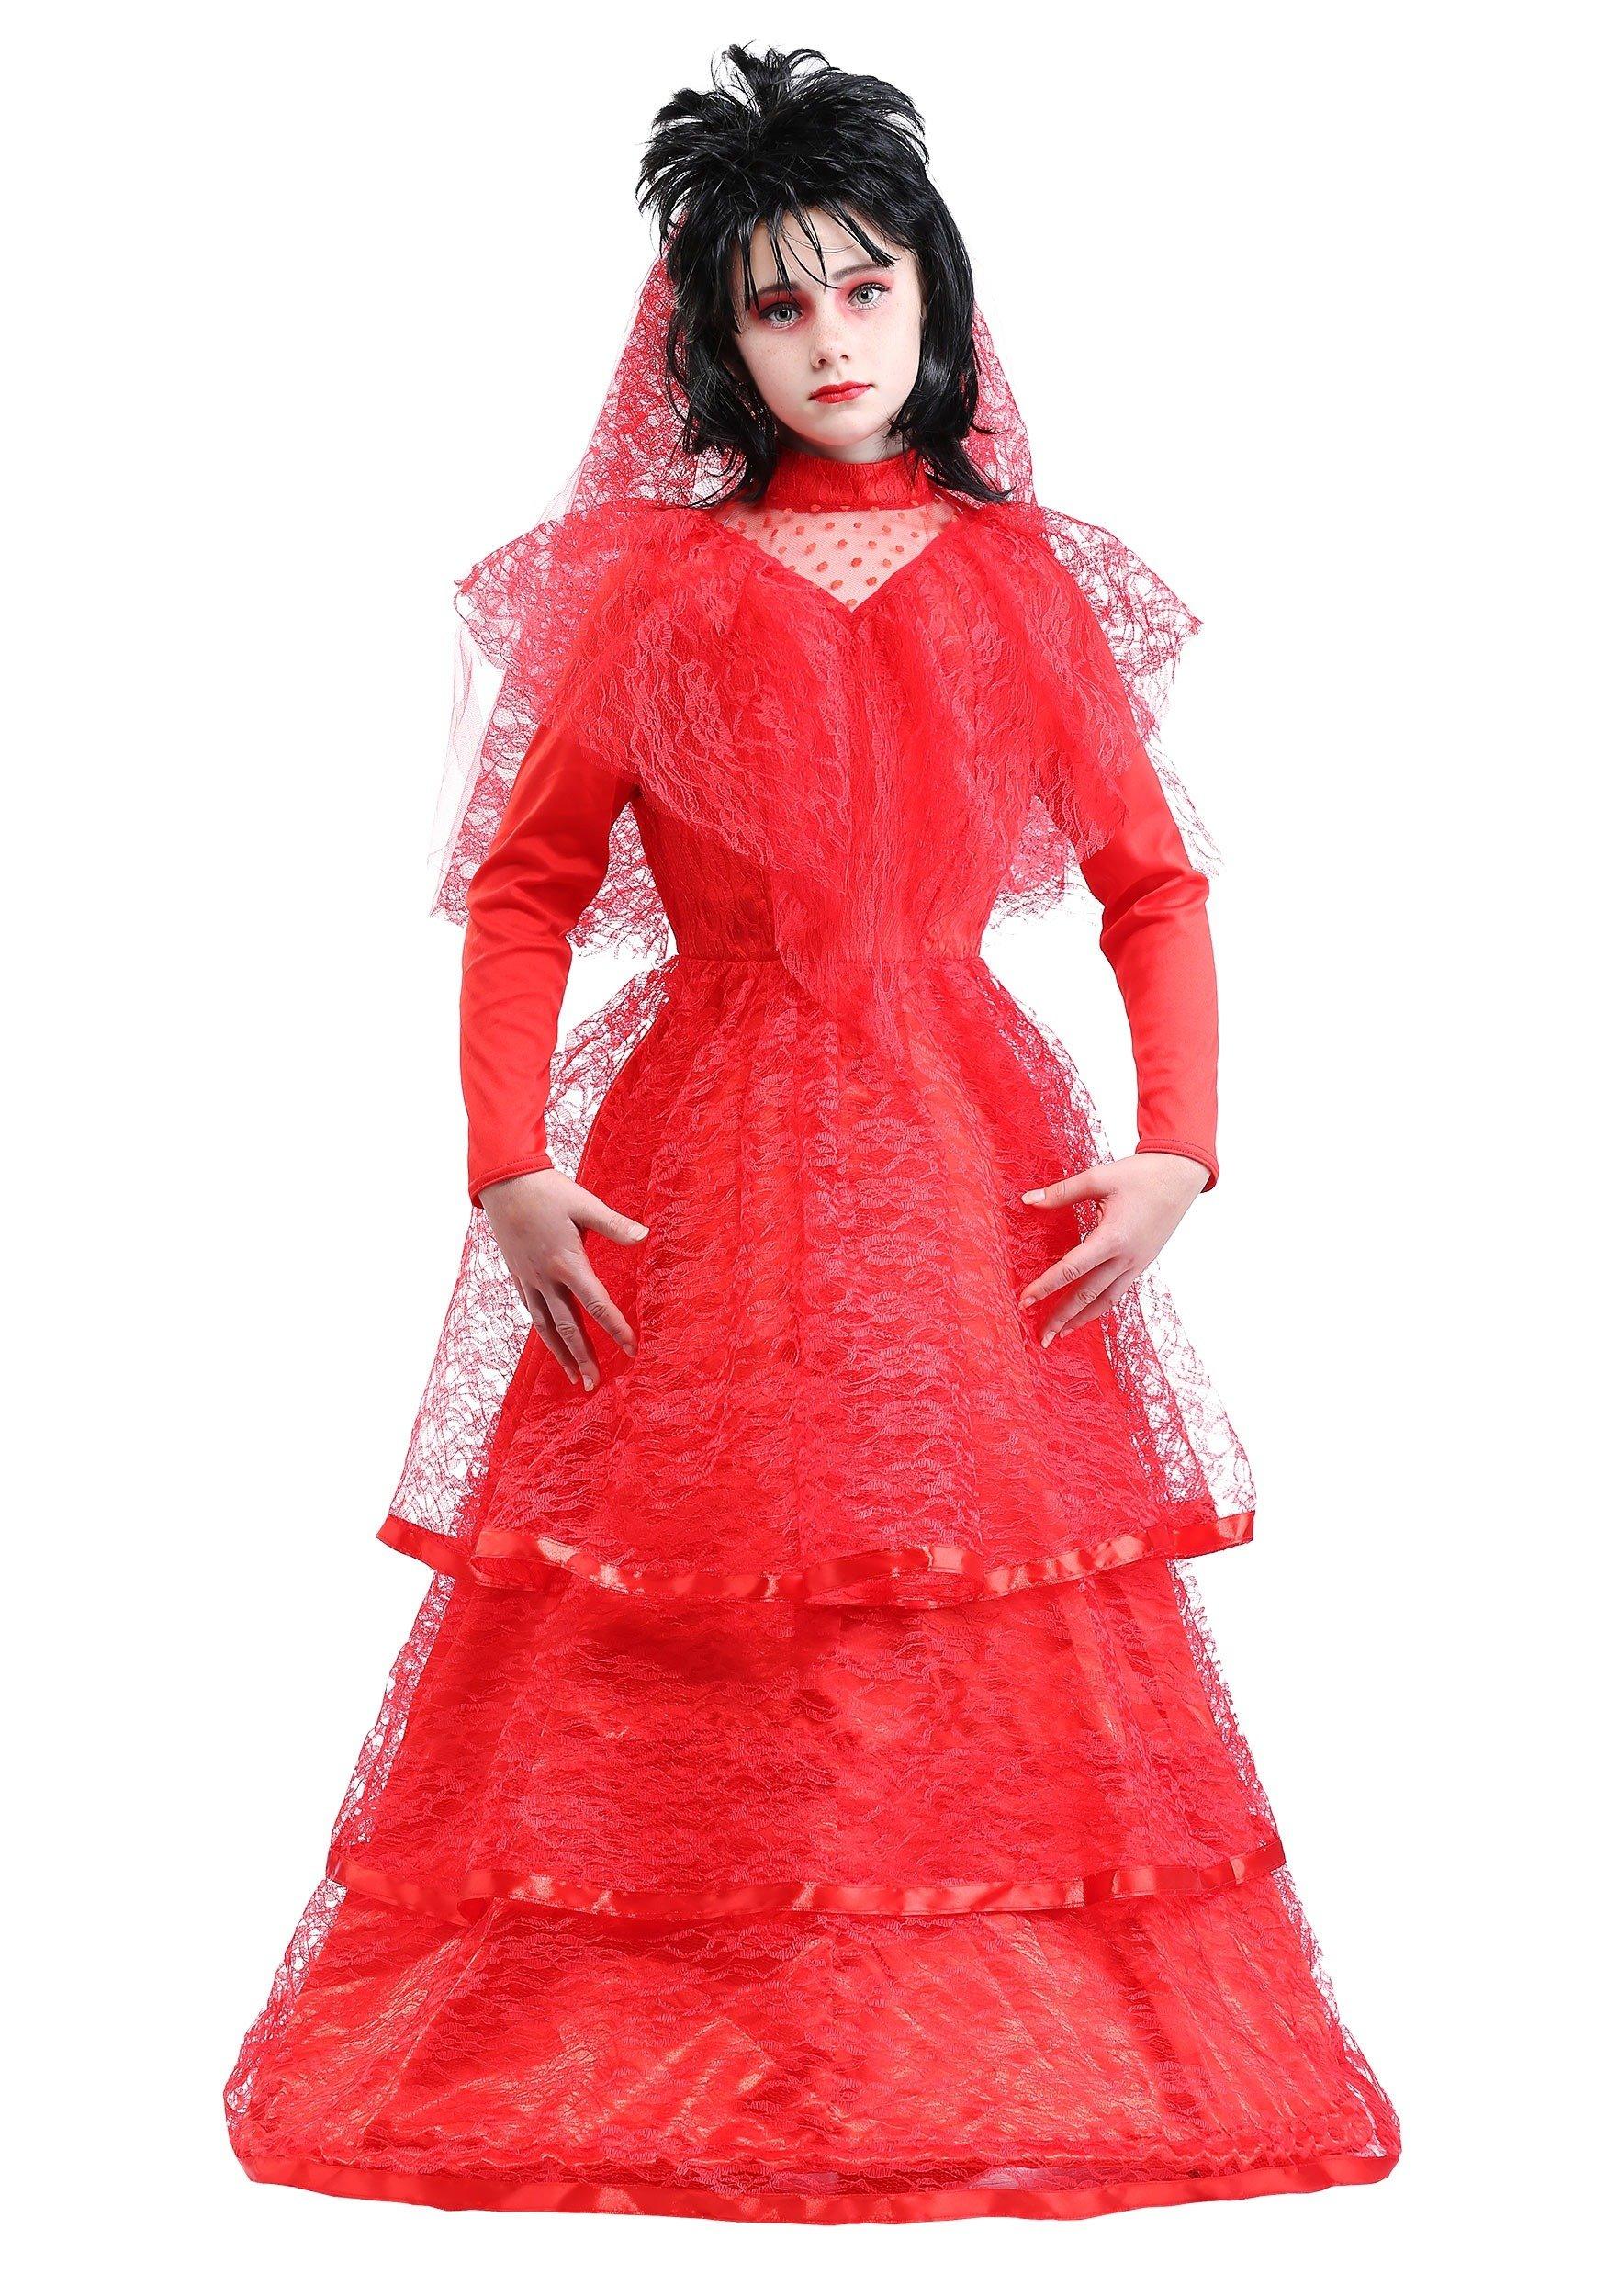 Child Gothic Red Wedding Dress - S